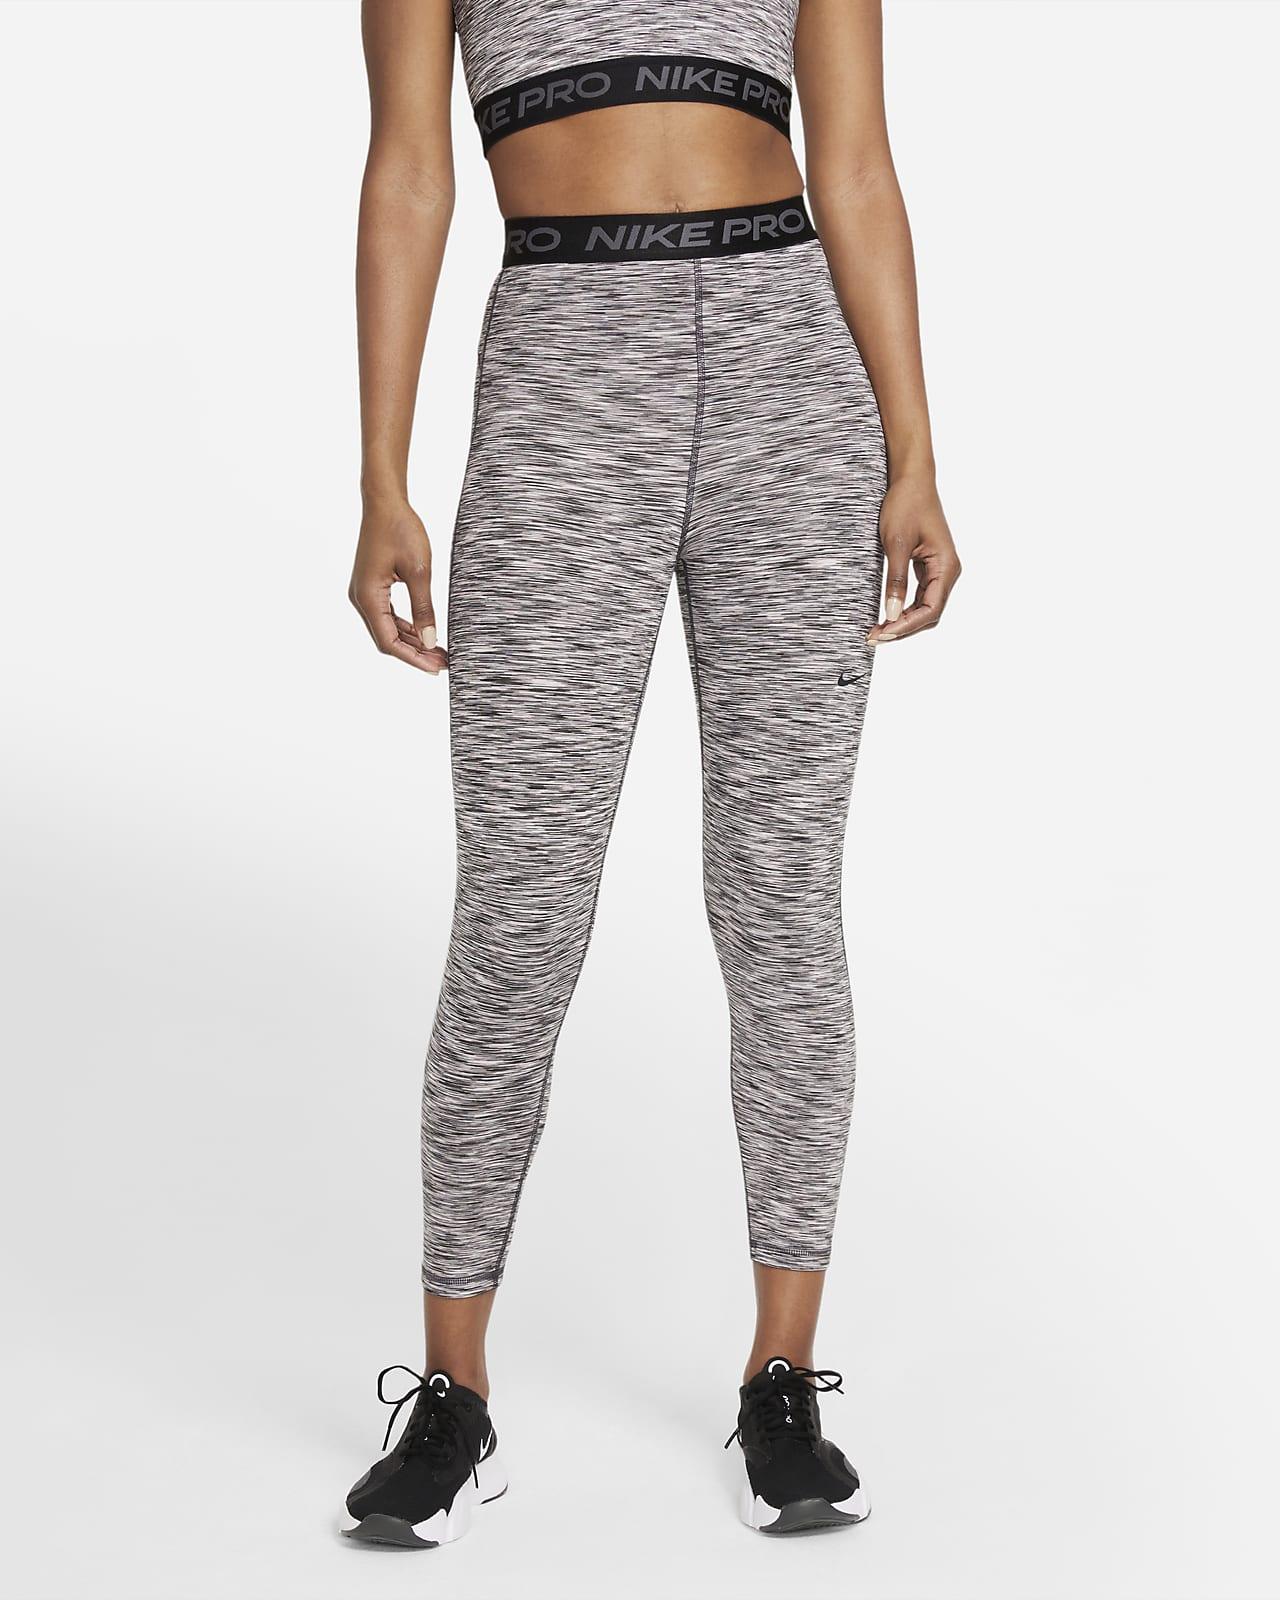 Nike Pro Women's High-Waisted Crop Space-Dye Leggings